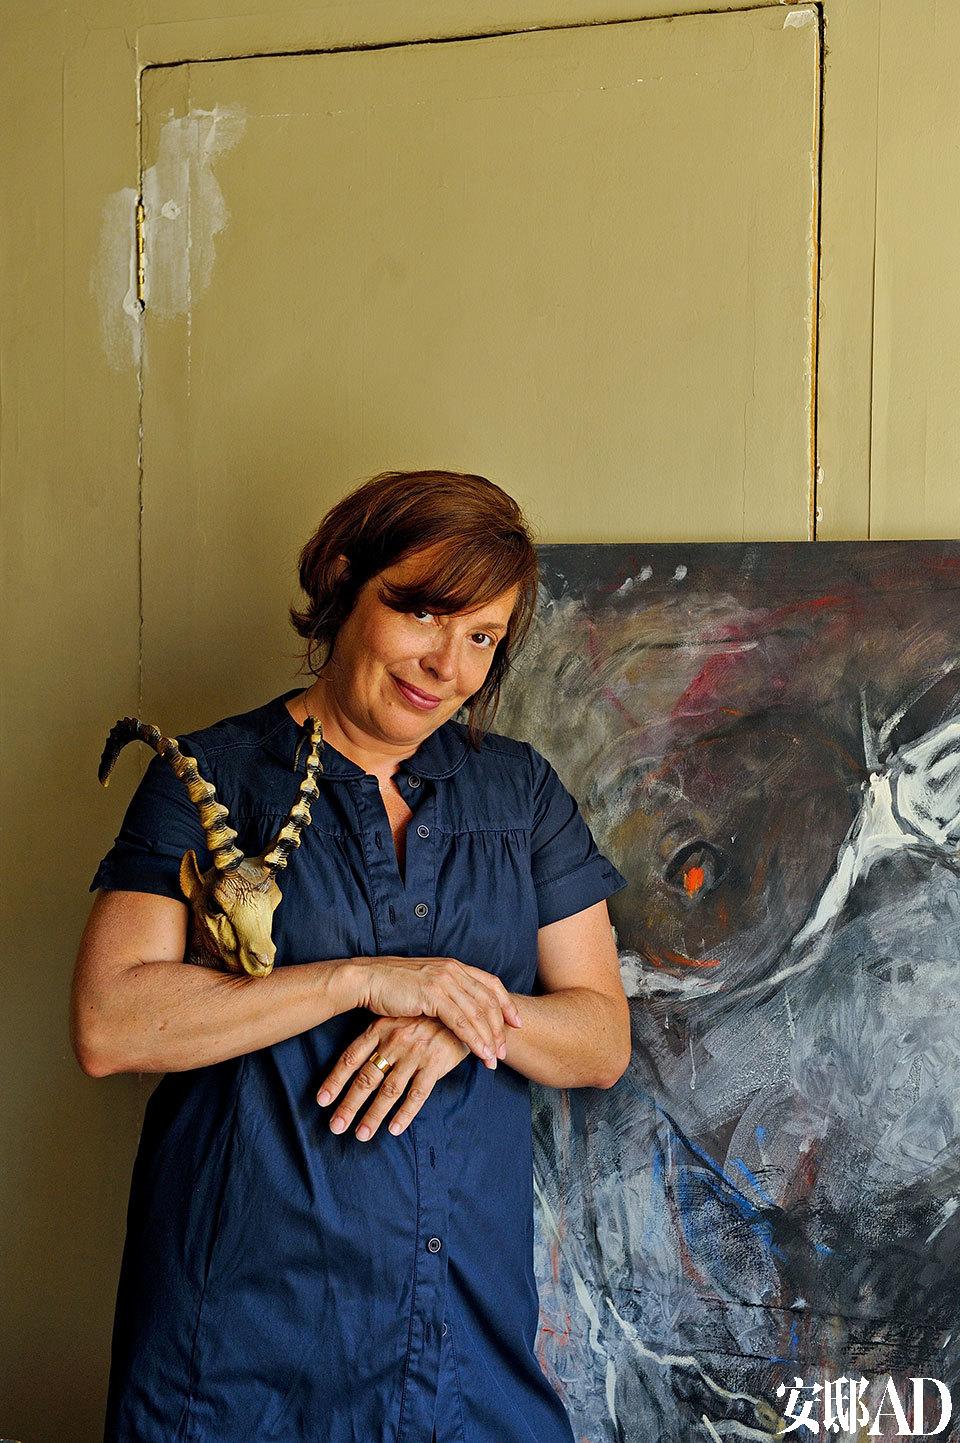 Frédérique Morrell热爱充满民族性和童话幻象的艺术风格。 主人:Frédérique Morrel,法国艺术家,与丈夫Aaron Levin一起创立了自己的同名品牌,以精彩的手制玻璃纤维标本模型及纺织工艺品而广获好评。Frédérique自1983年起,担任Ecole Supérieure d'Arts Appliqués Duperré艺术学院的教授,1990年投身装饰工艺品设计行业,2002年起又全情投入艺术创作的世界,尤其钟爱带有民族性与童话色彩的拼接风格。她的作品以融合艺术、设计及手工艺之间的界限见称,为一成不变的现实生活带来绚丽多姿的想象能量。